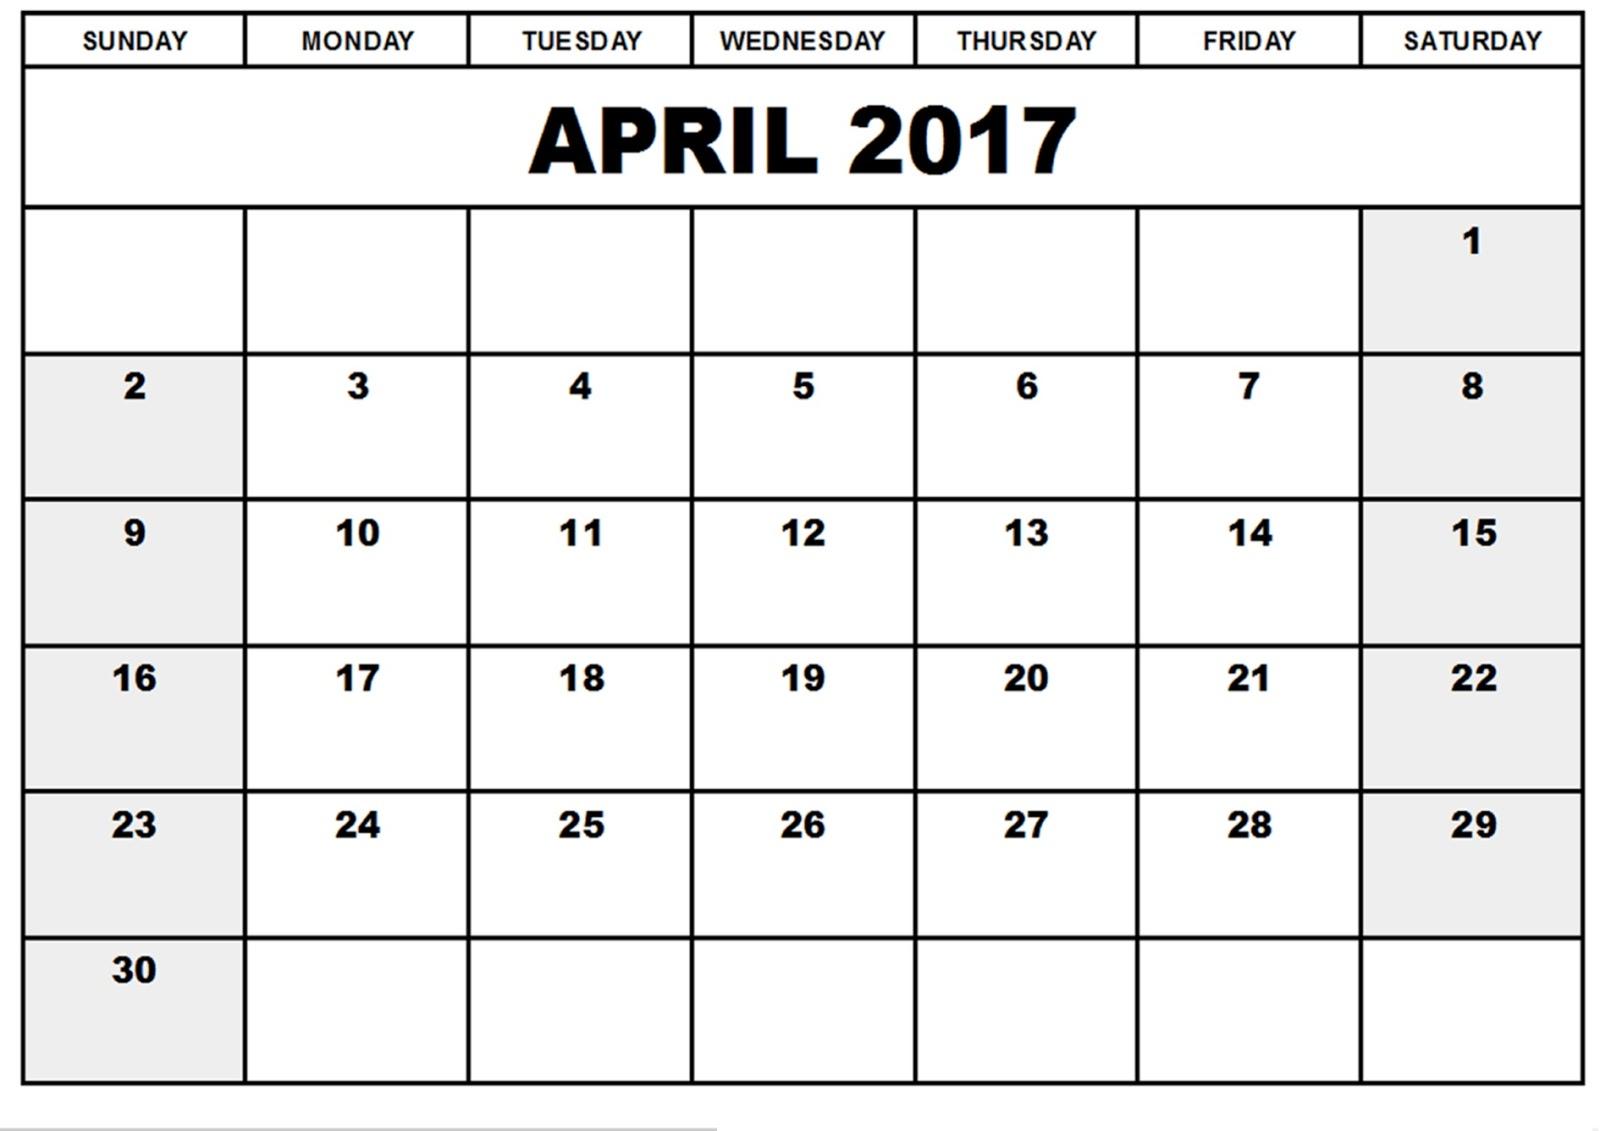 Calendar clipart april 2017. Blank incep imagine ex